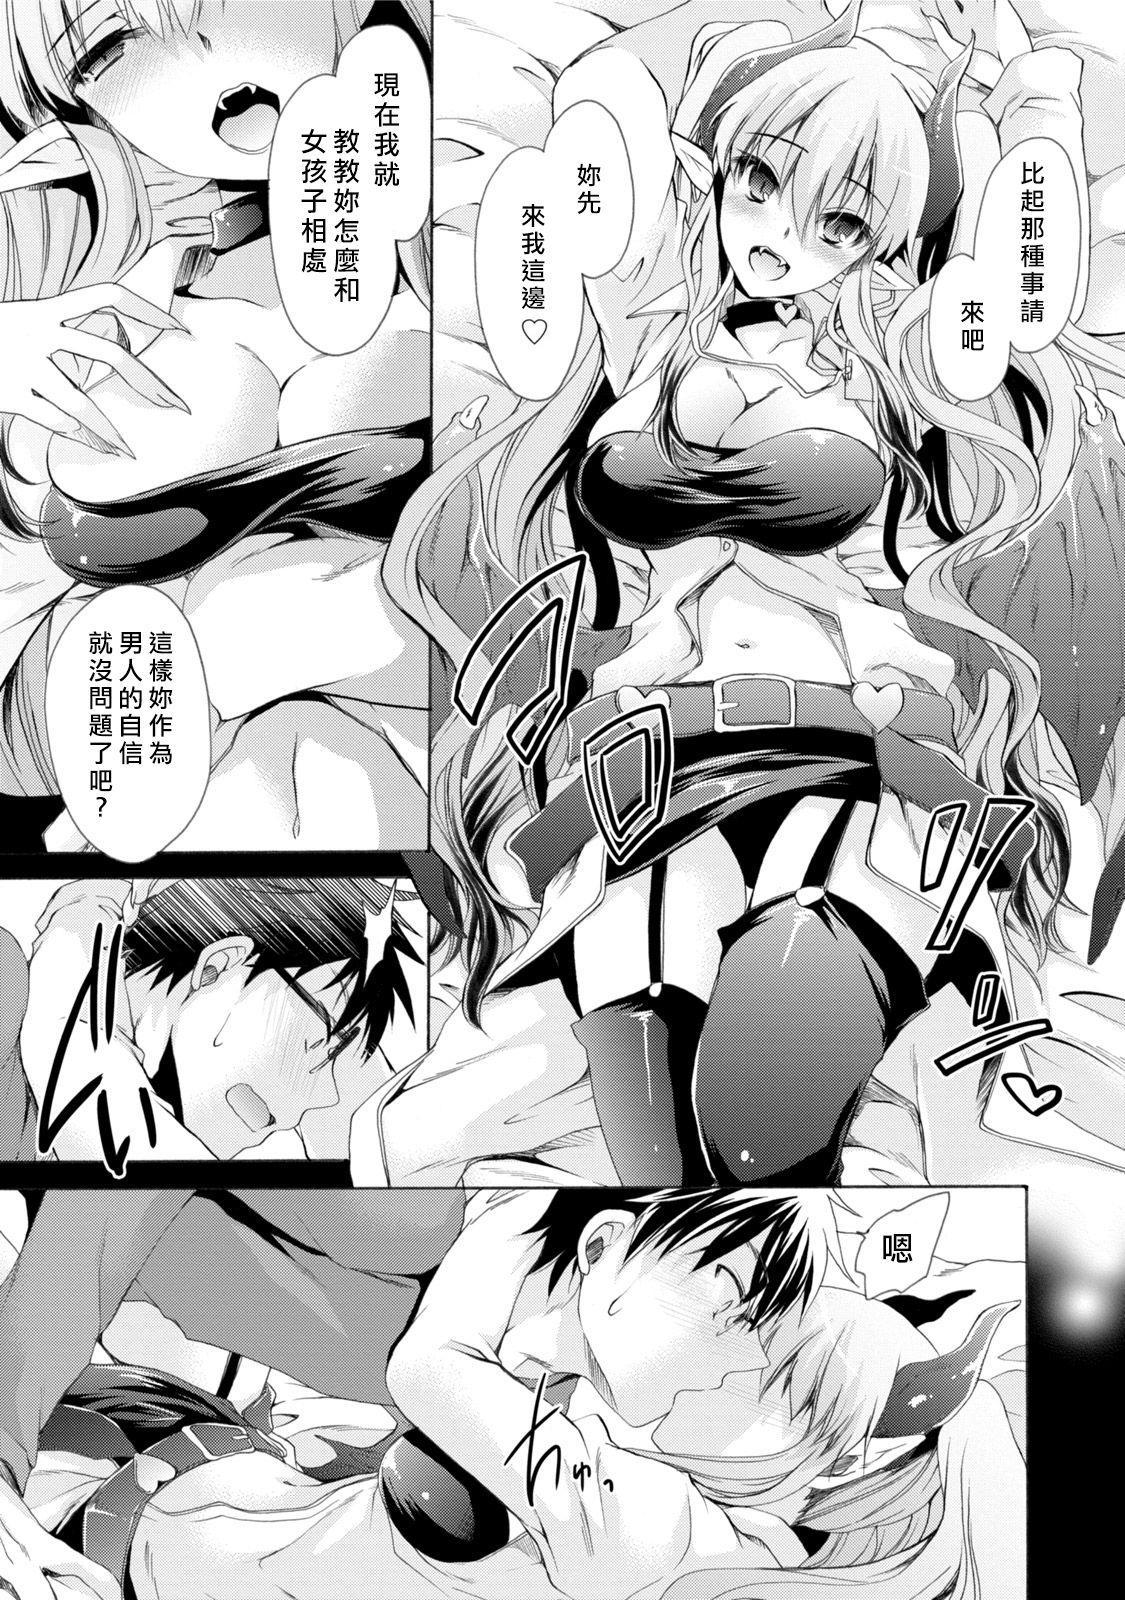 [Shinonome Ryu] Ore to Kanojo to Owaru Sekai - World's end LoveStory 1-5 [Chinese] [爱弹幕汉化组] [Digital] 14